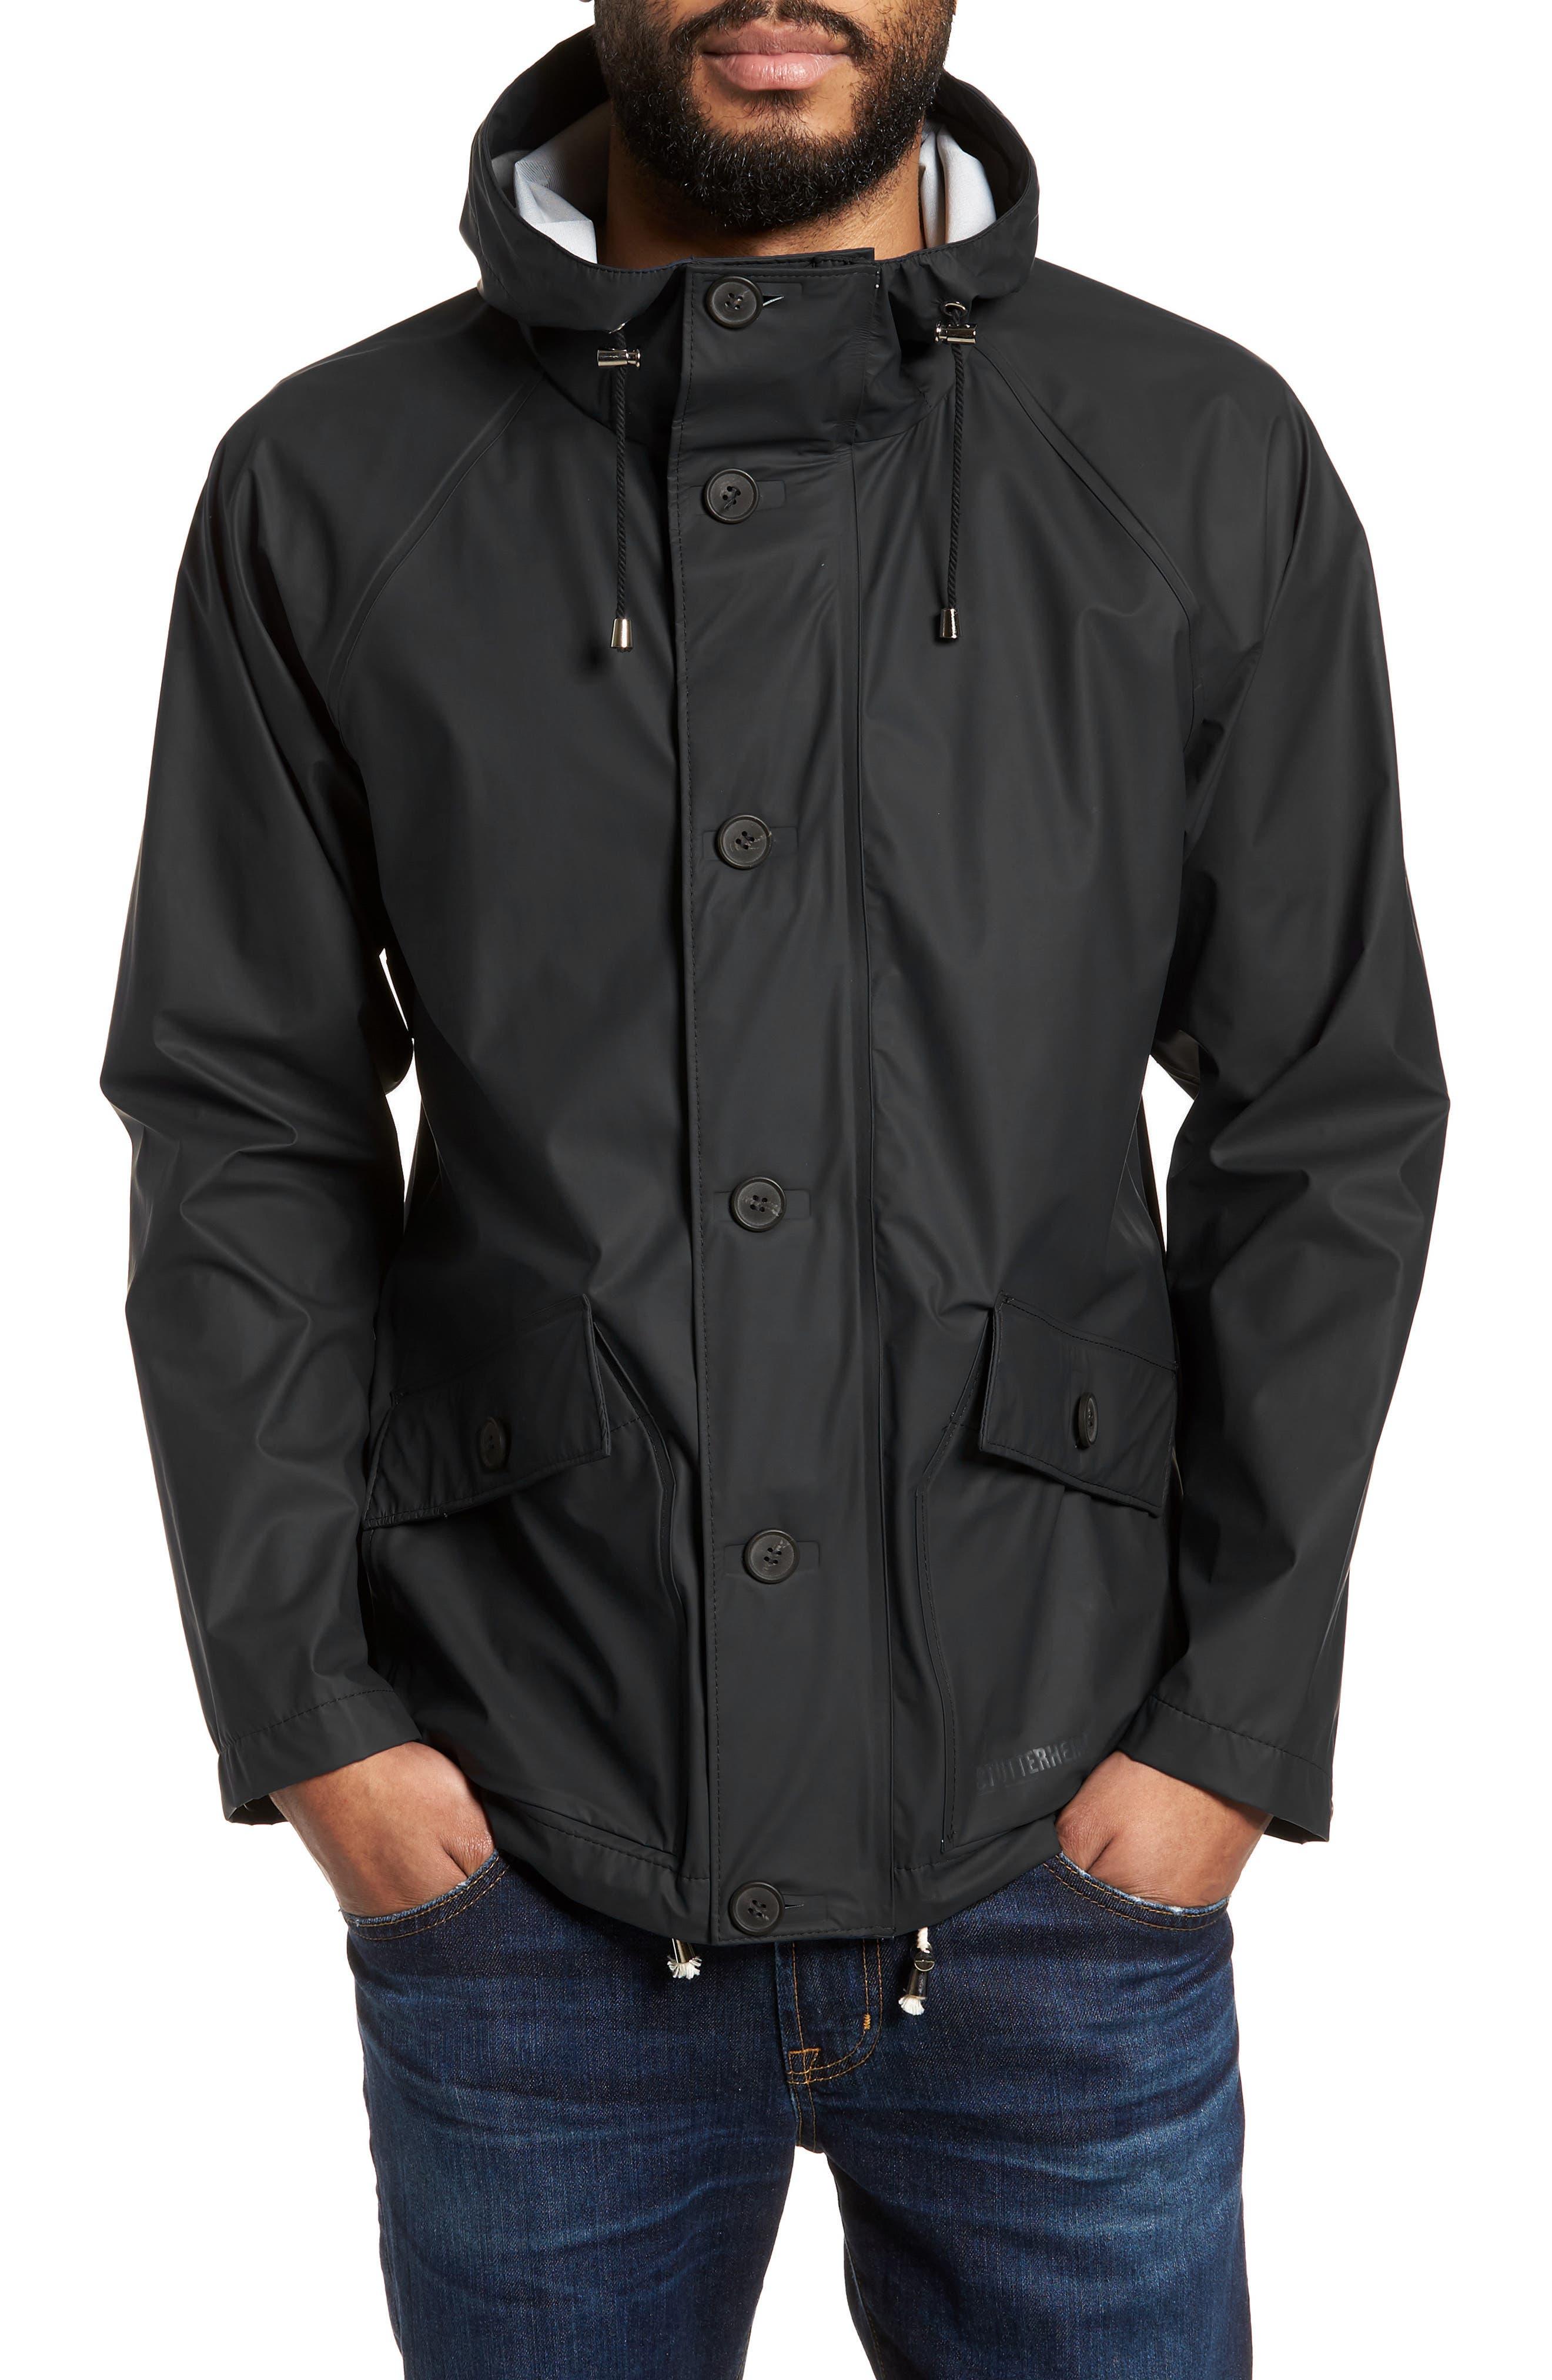 Stenhamra Classic Fit Jacket,                         Main,                         color, Black